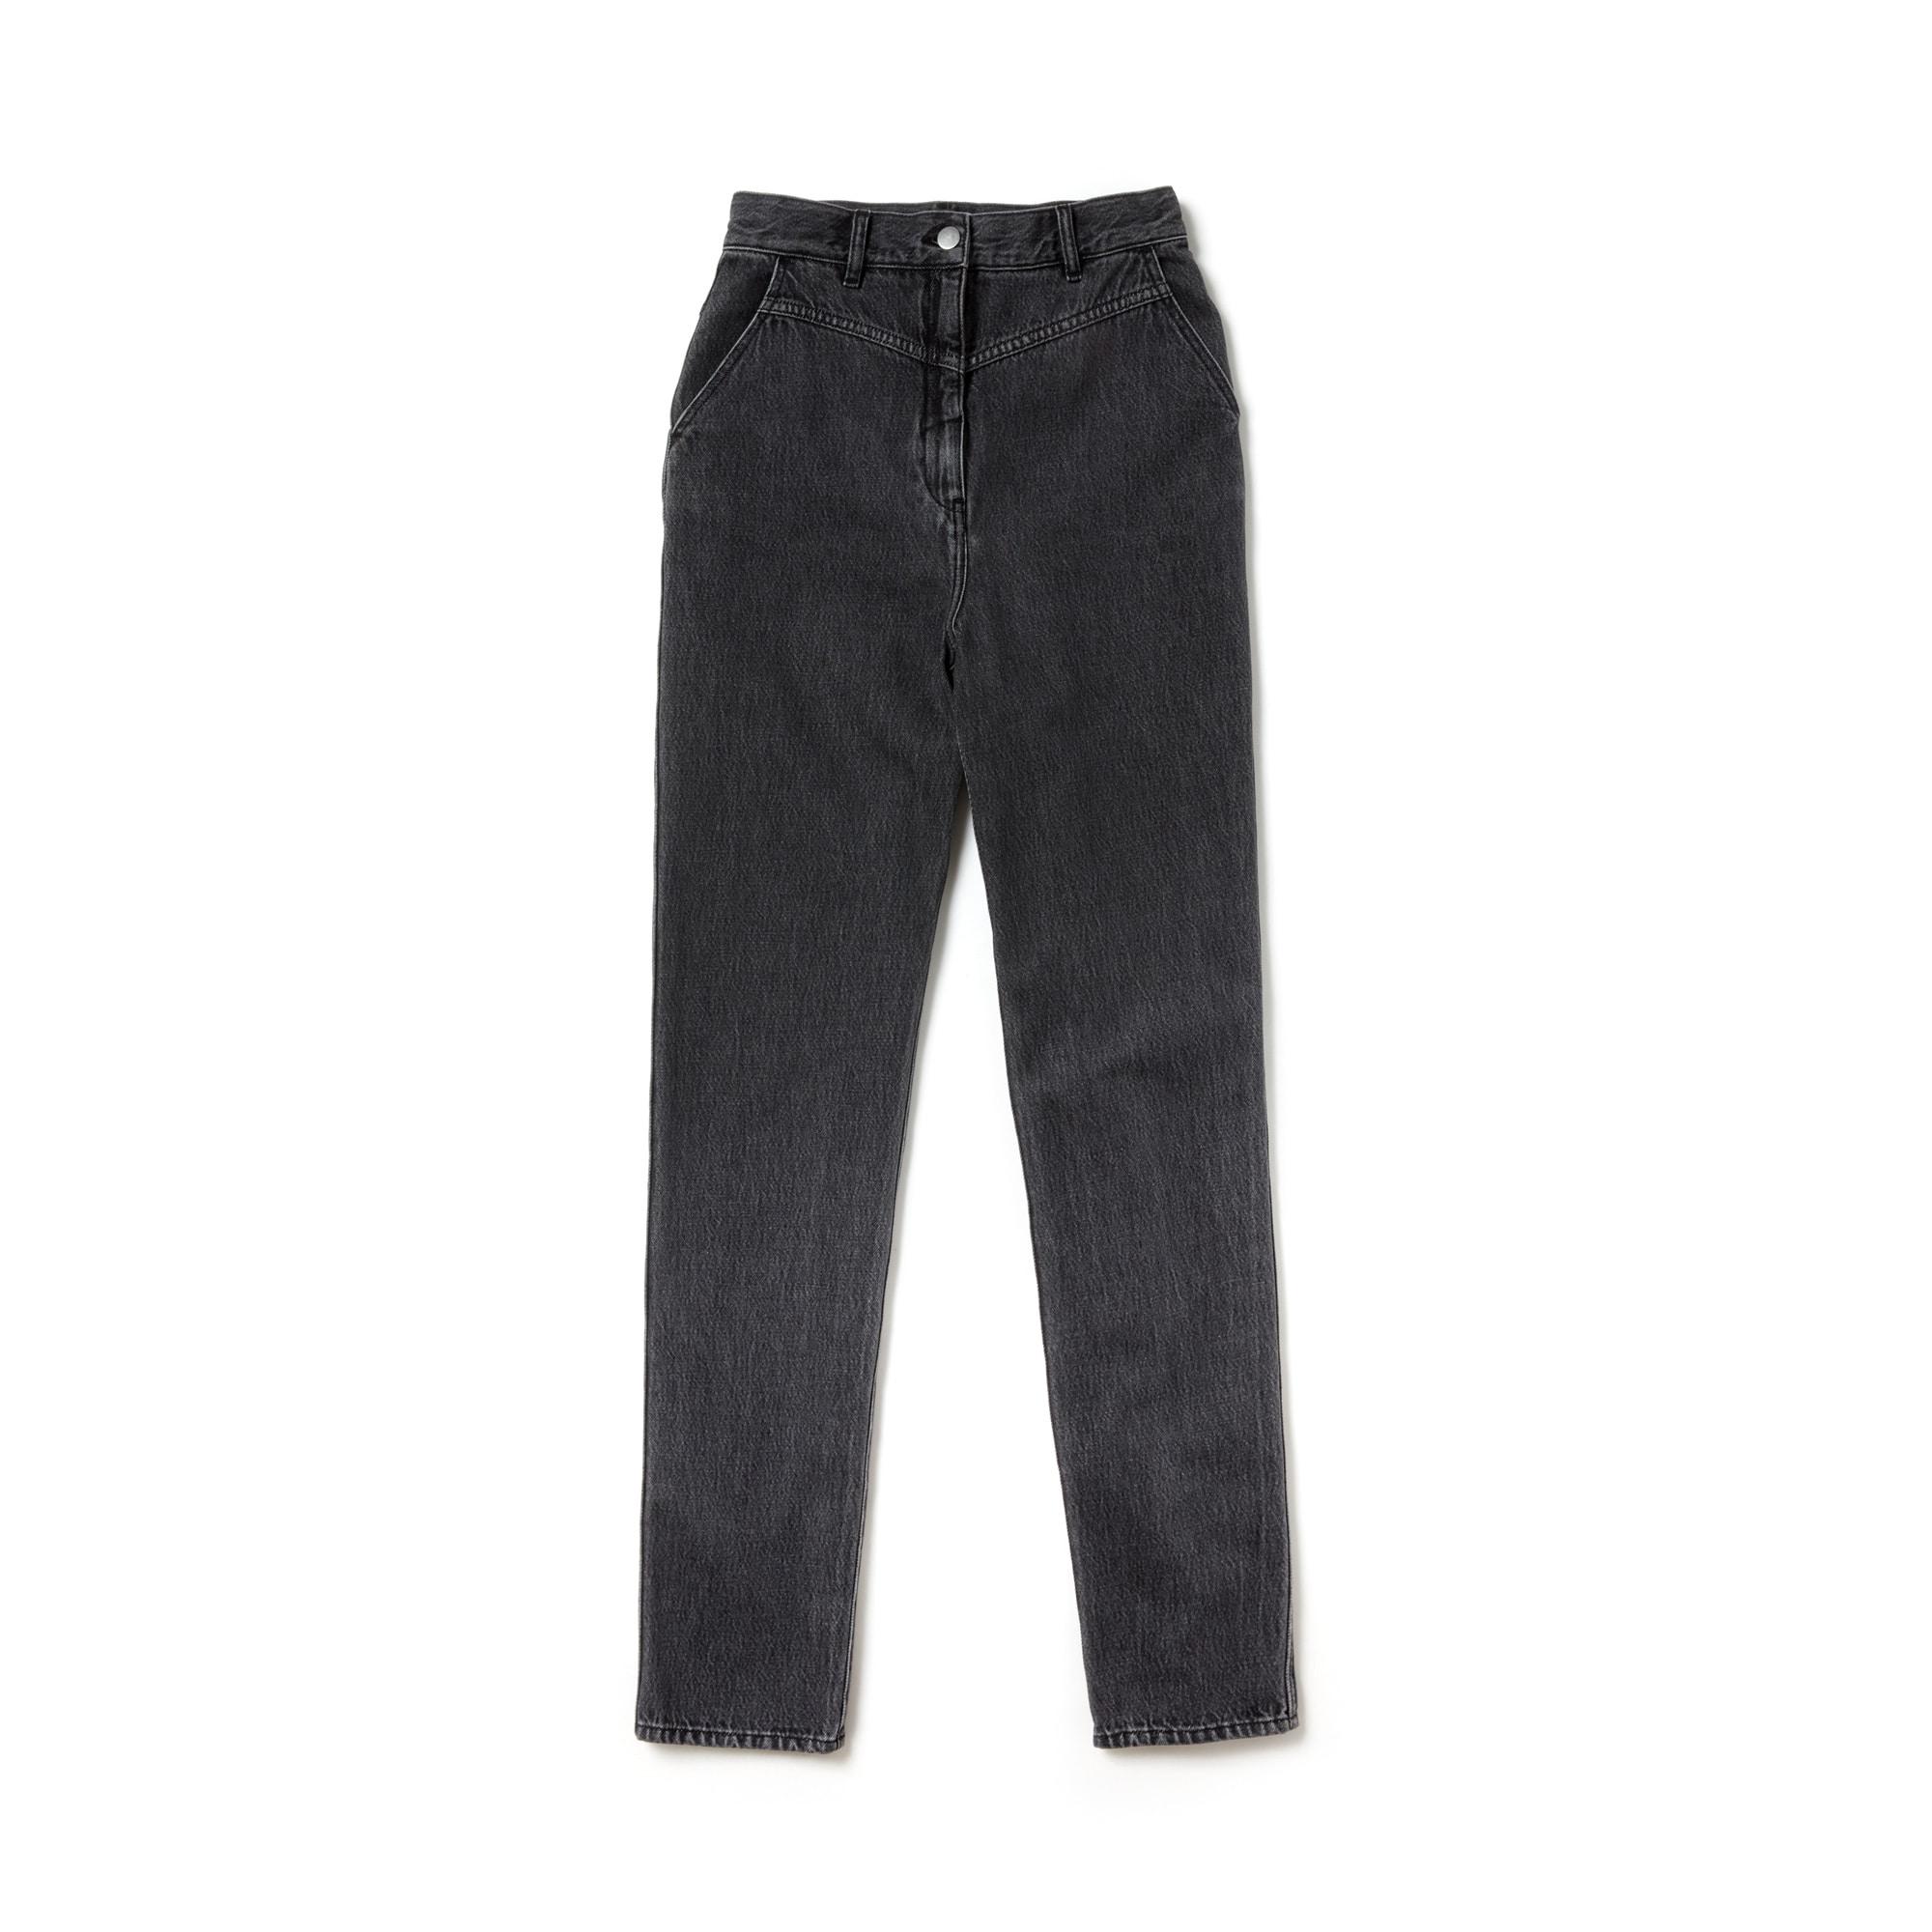 Fashion Show-jeans Dames Gebleekt Hoge Taille